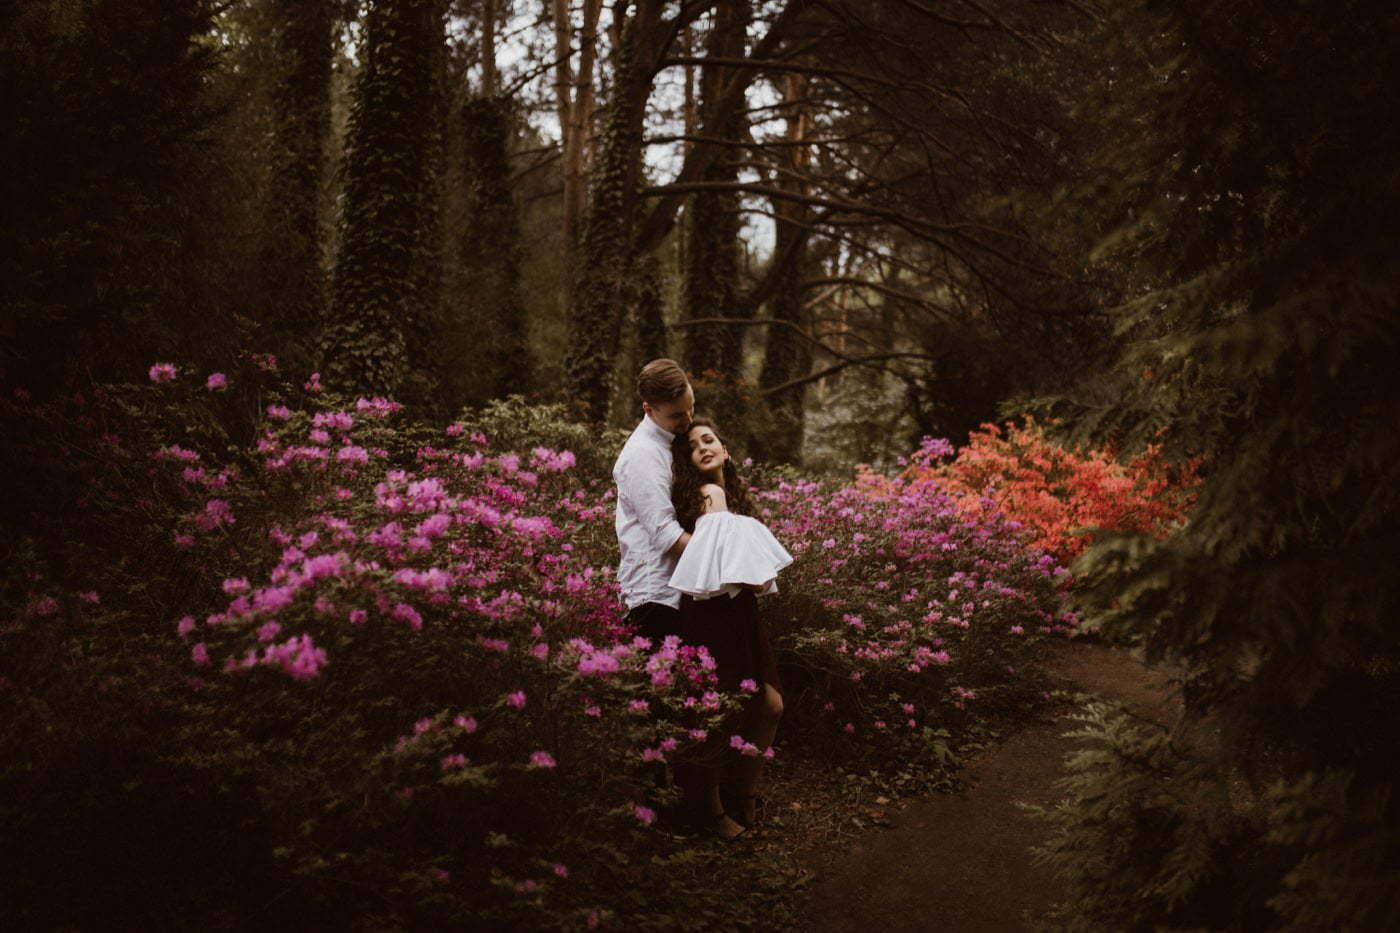 ewelina zieba sesja narzeczenska kwiaty warszawa 02